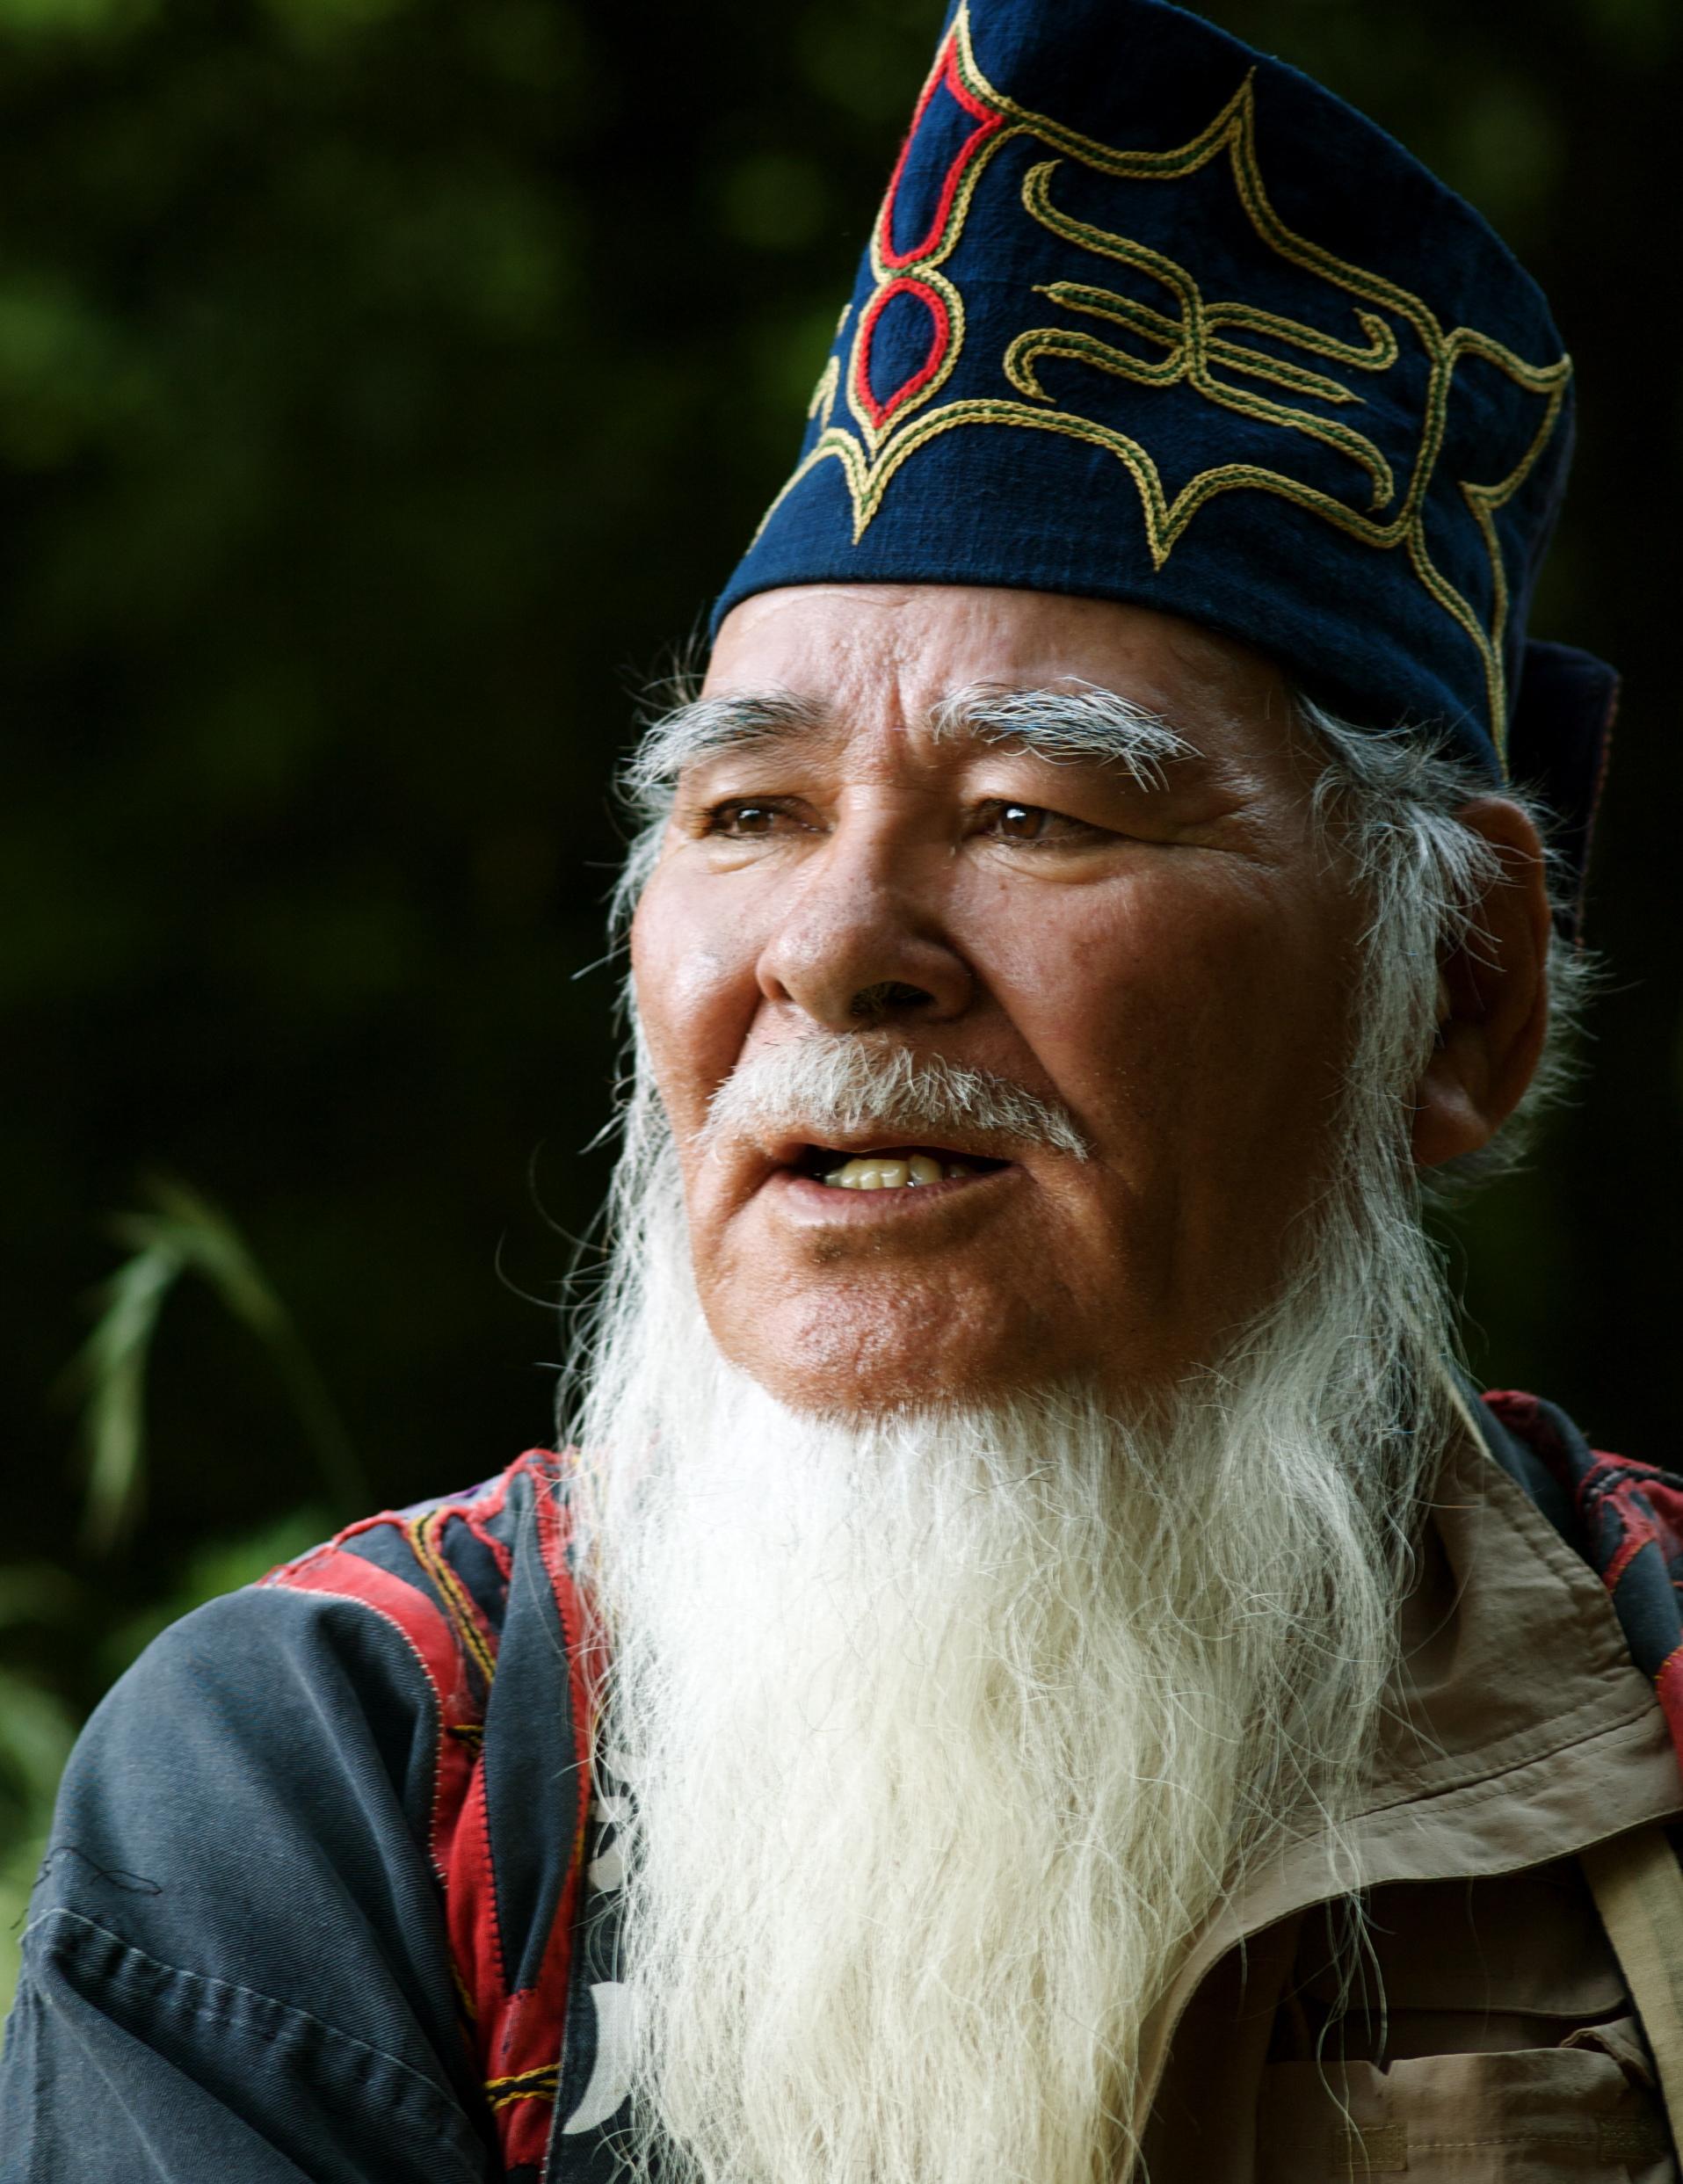 Haruzou Urakawa